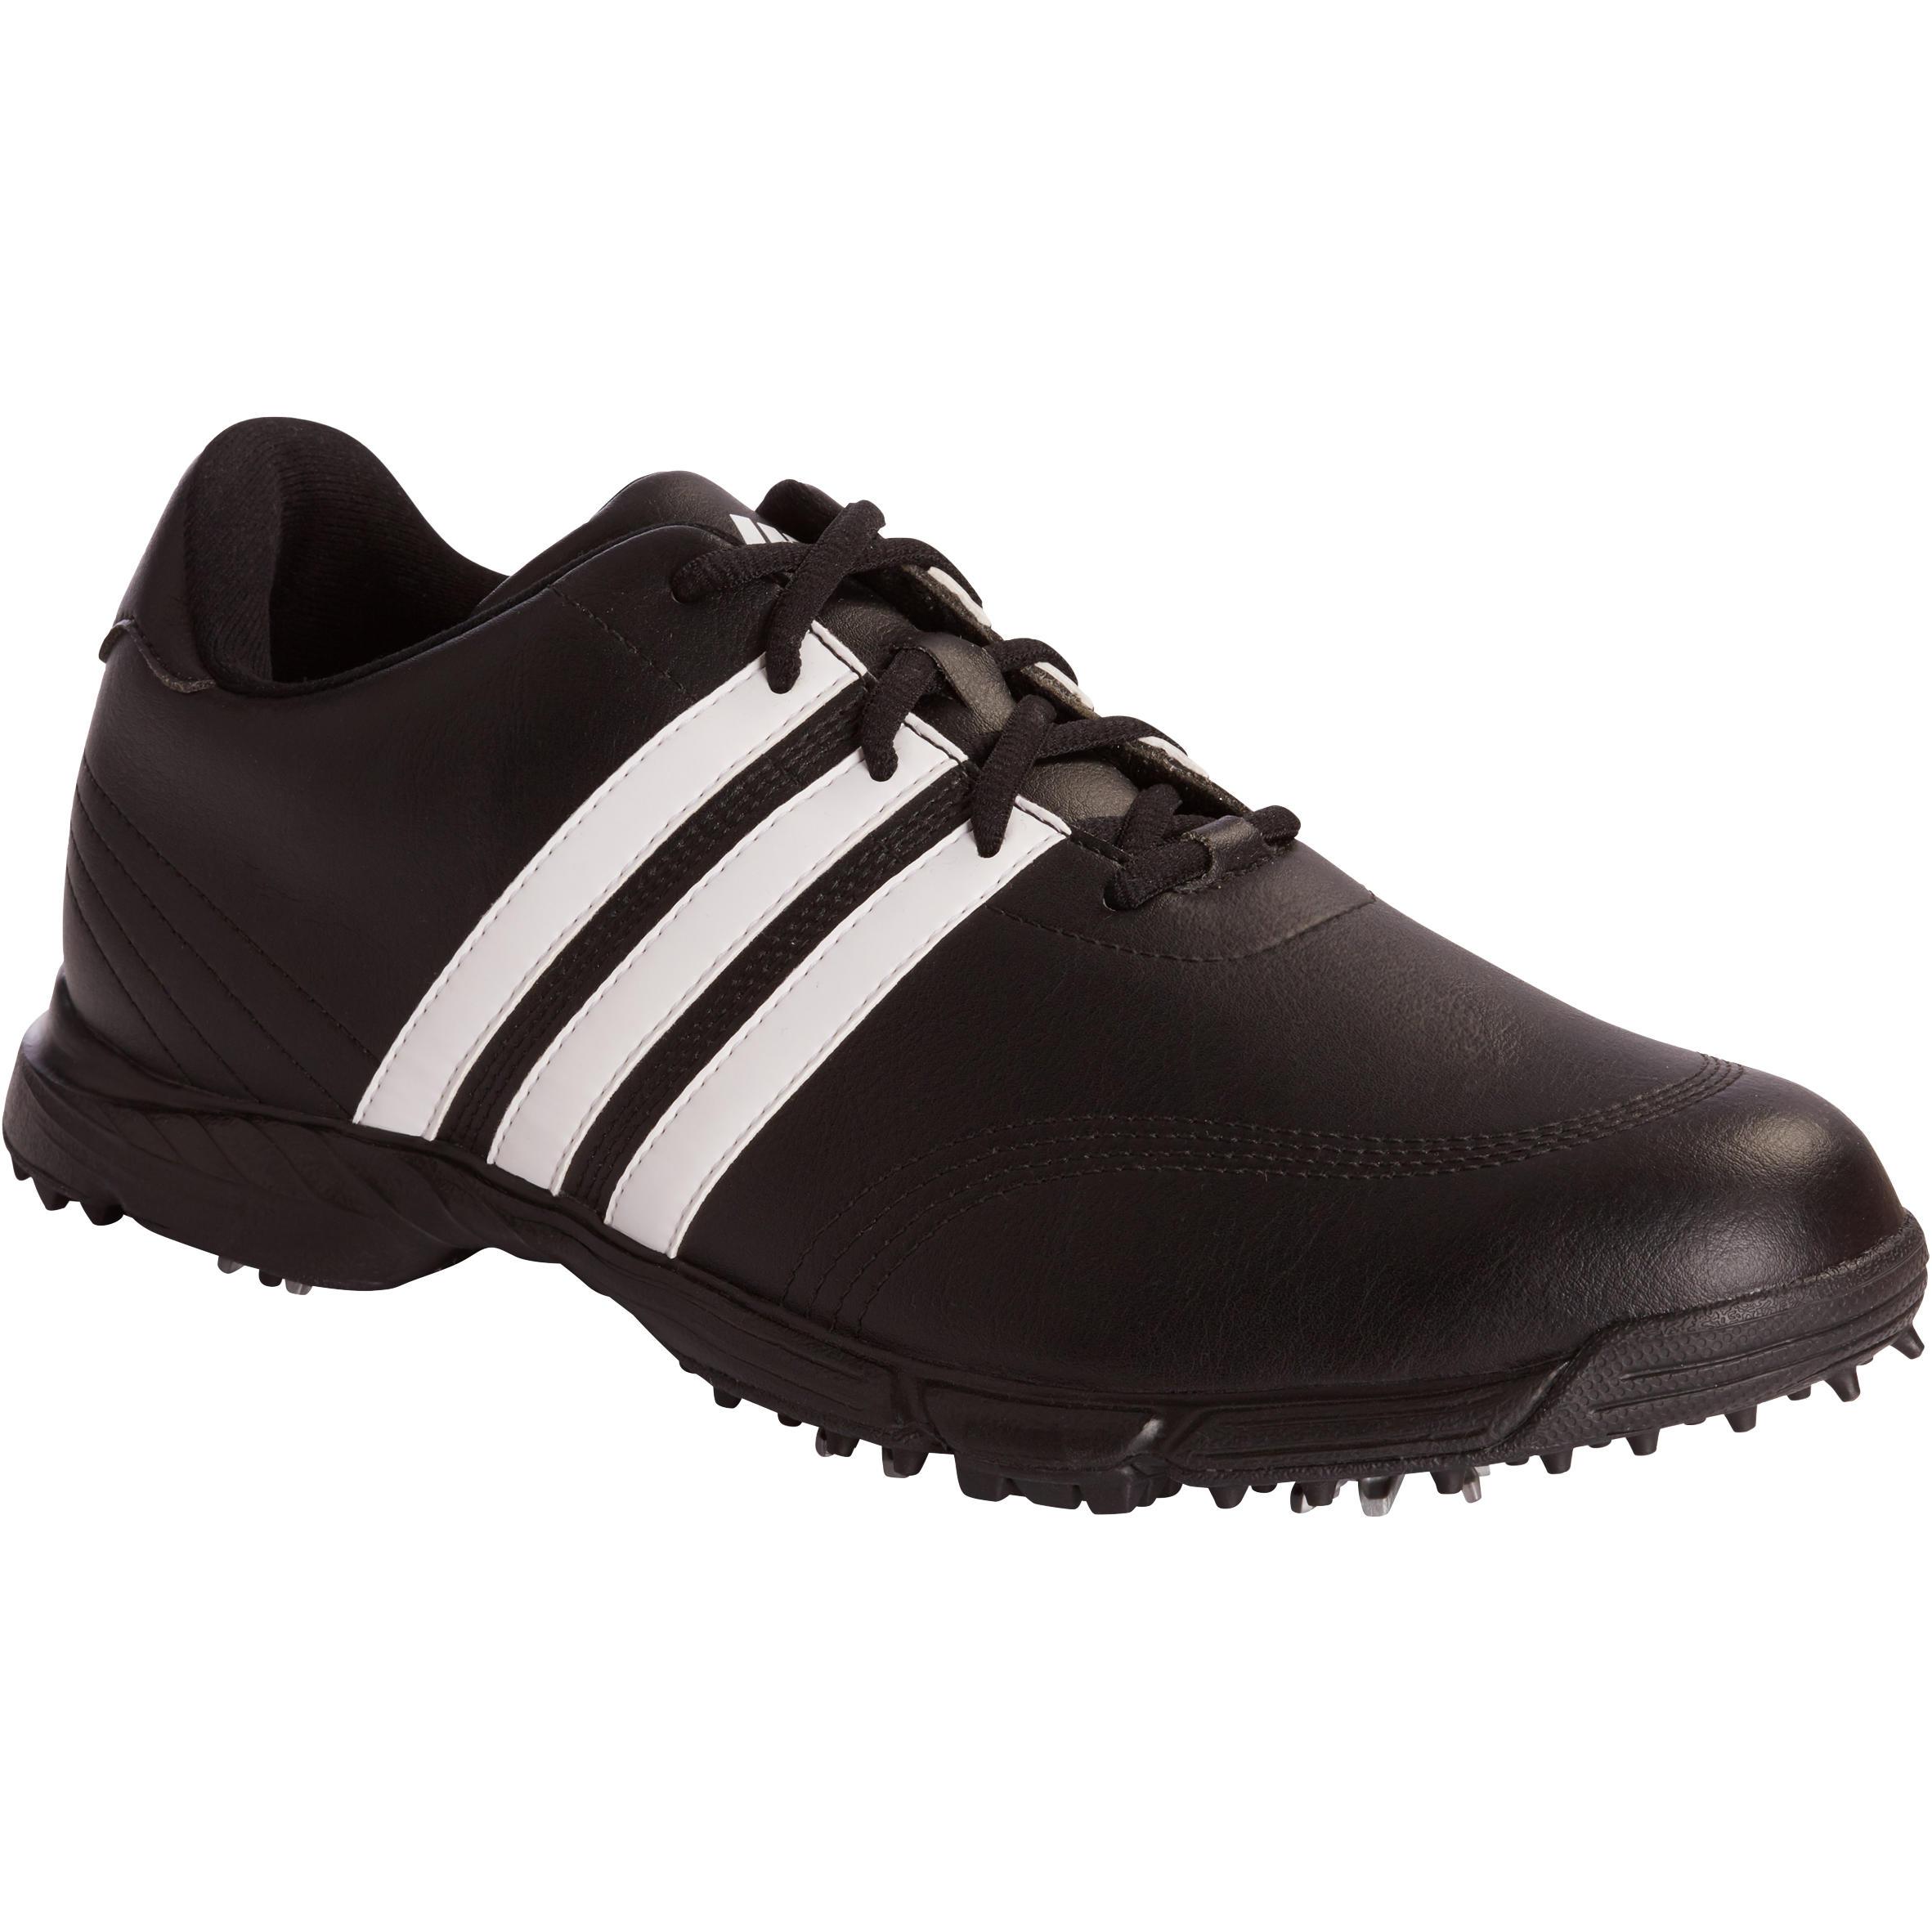 Adidas Waterdichte golfschoenen Golflite voor heren zwart